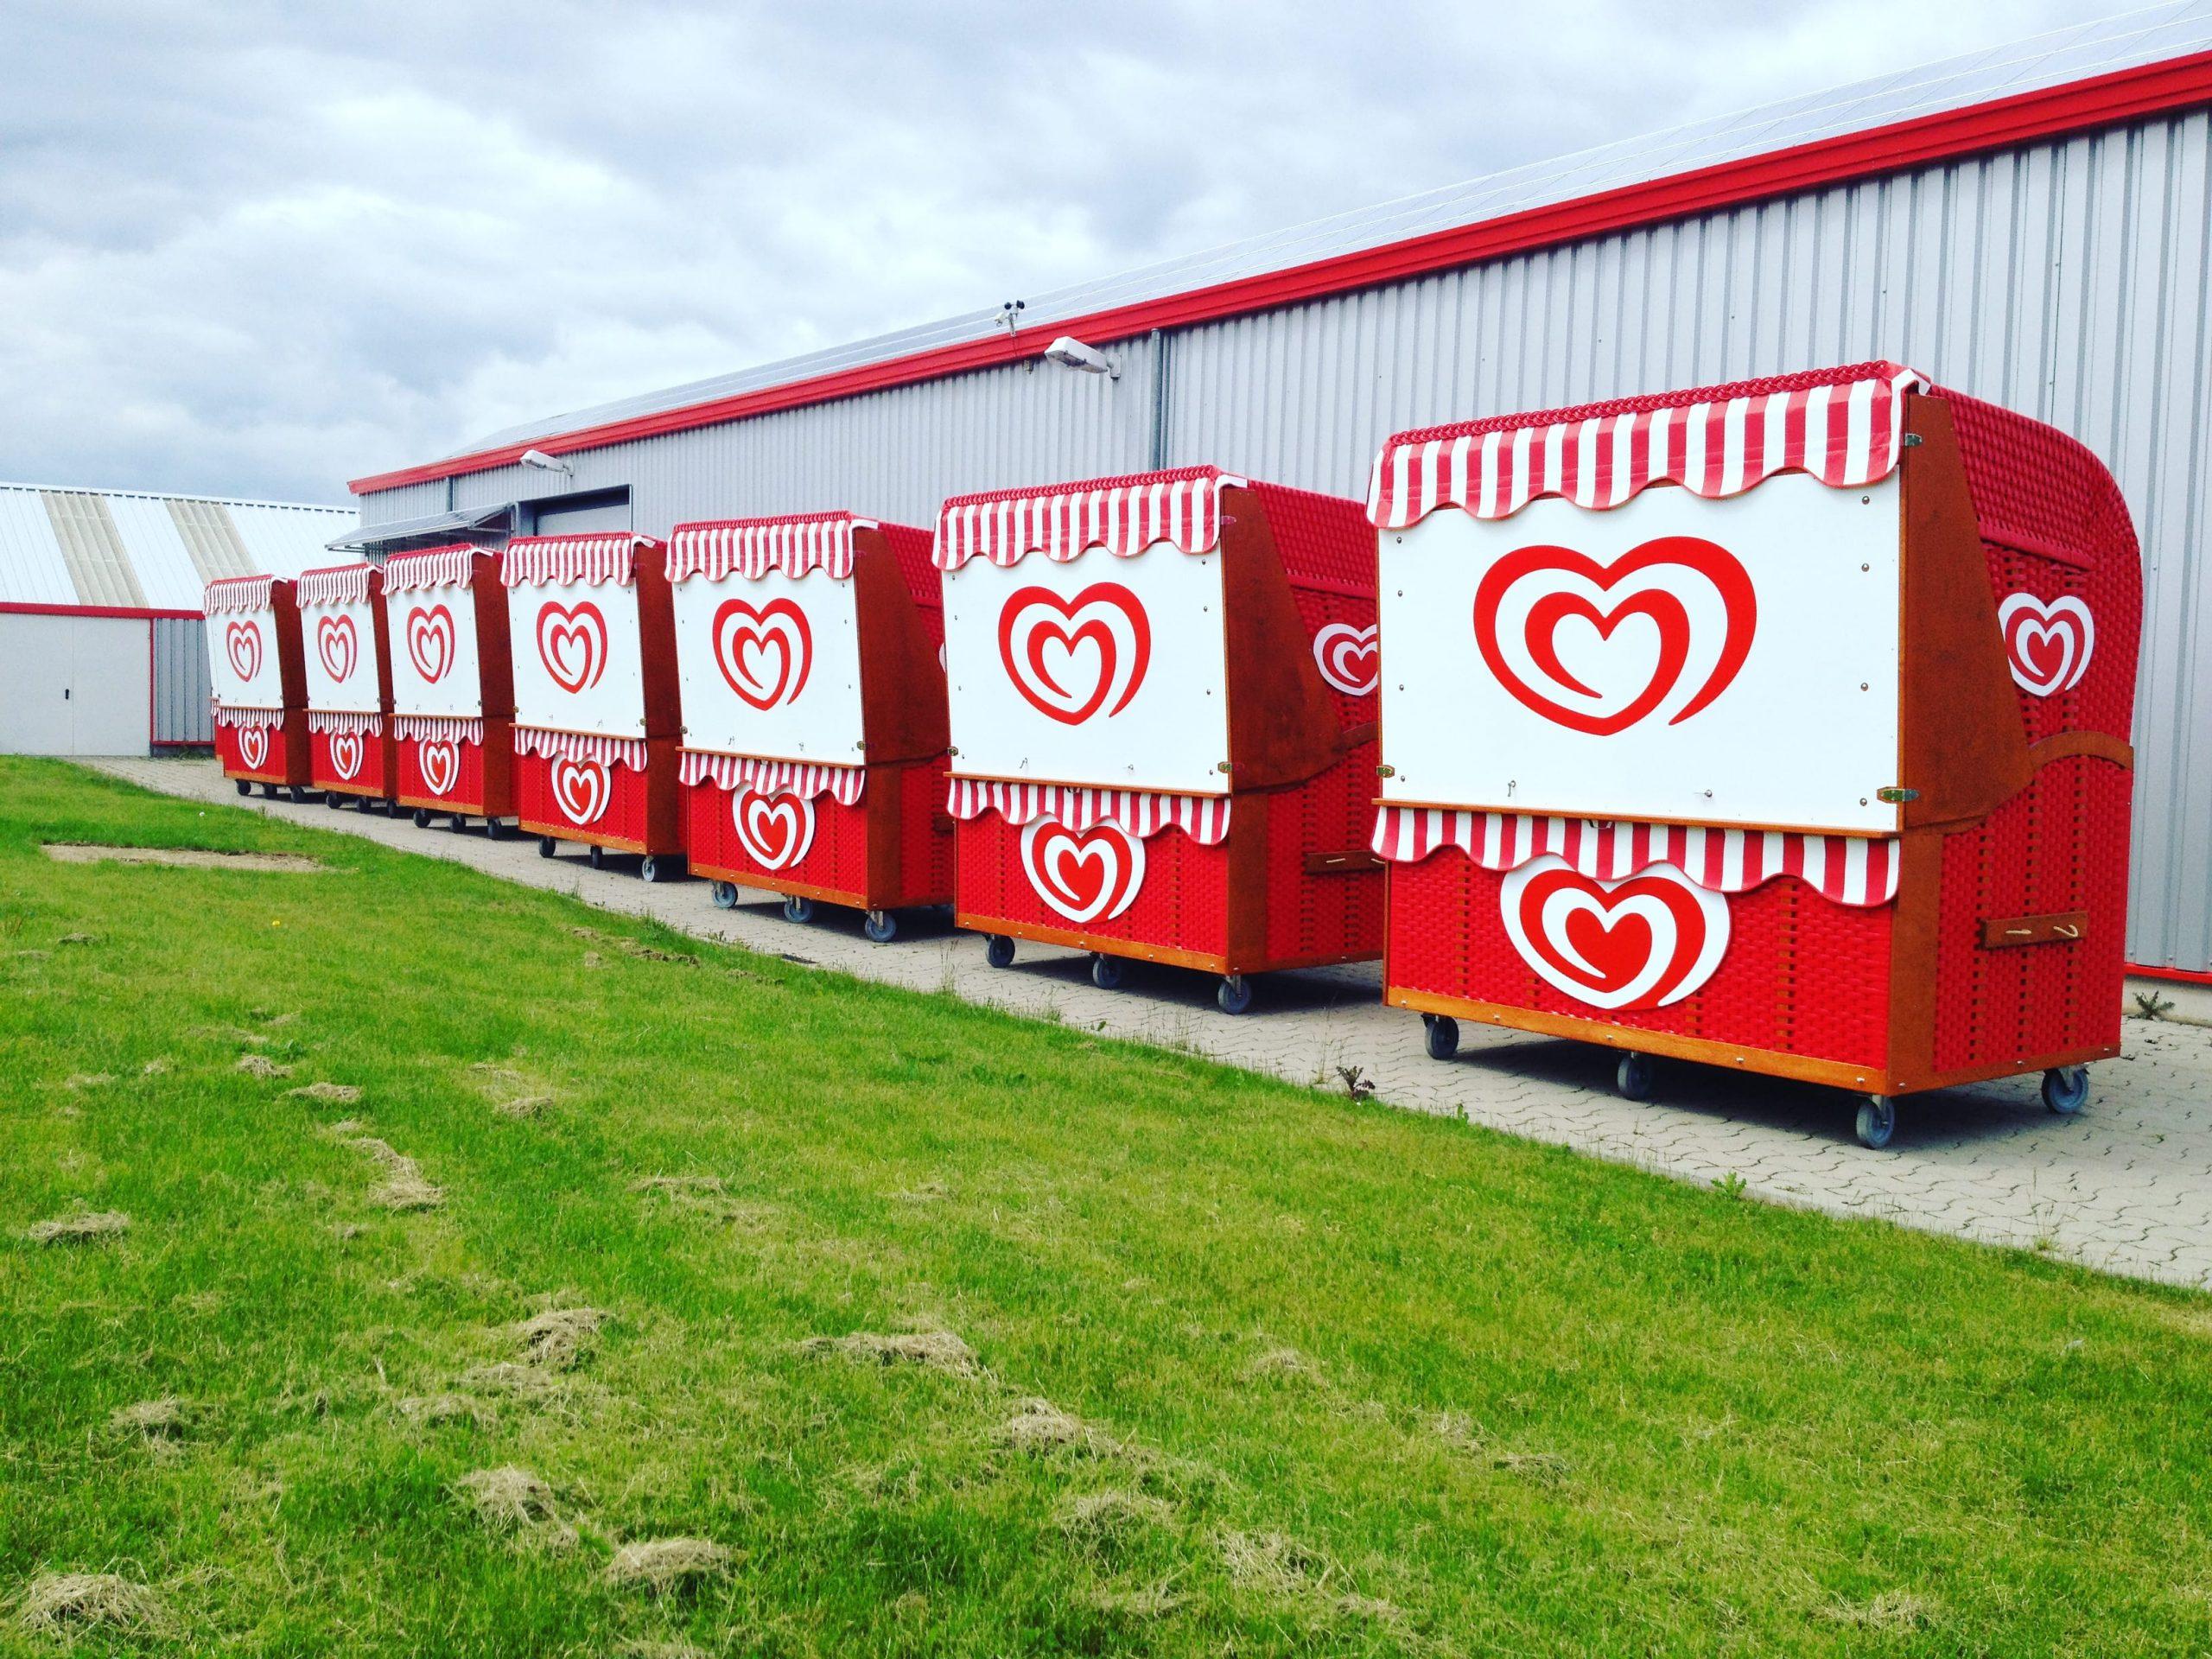 Verkaufskiosk Strandkorb Outdoor Verkaufsstand Imbiss Container Eis Kiosk